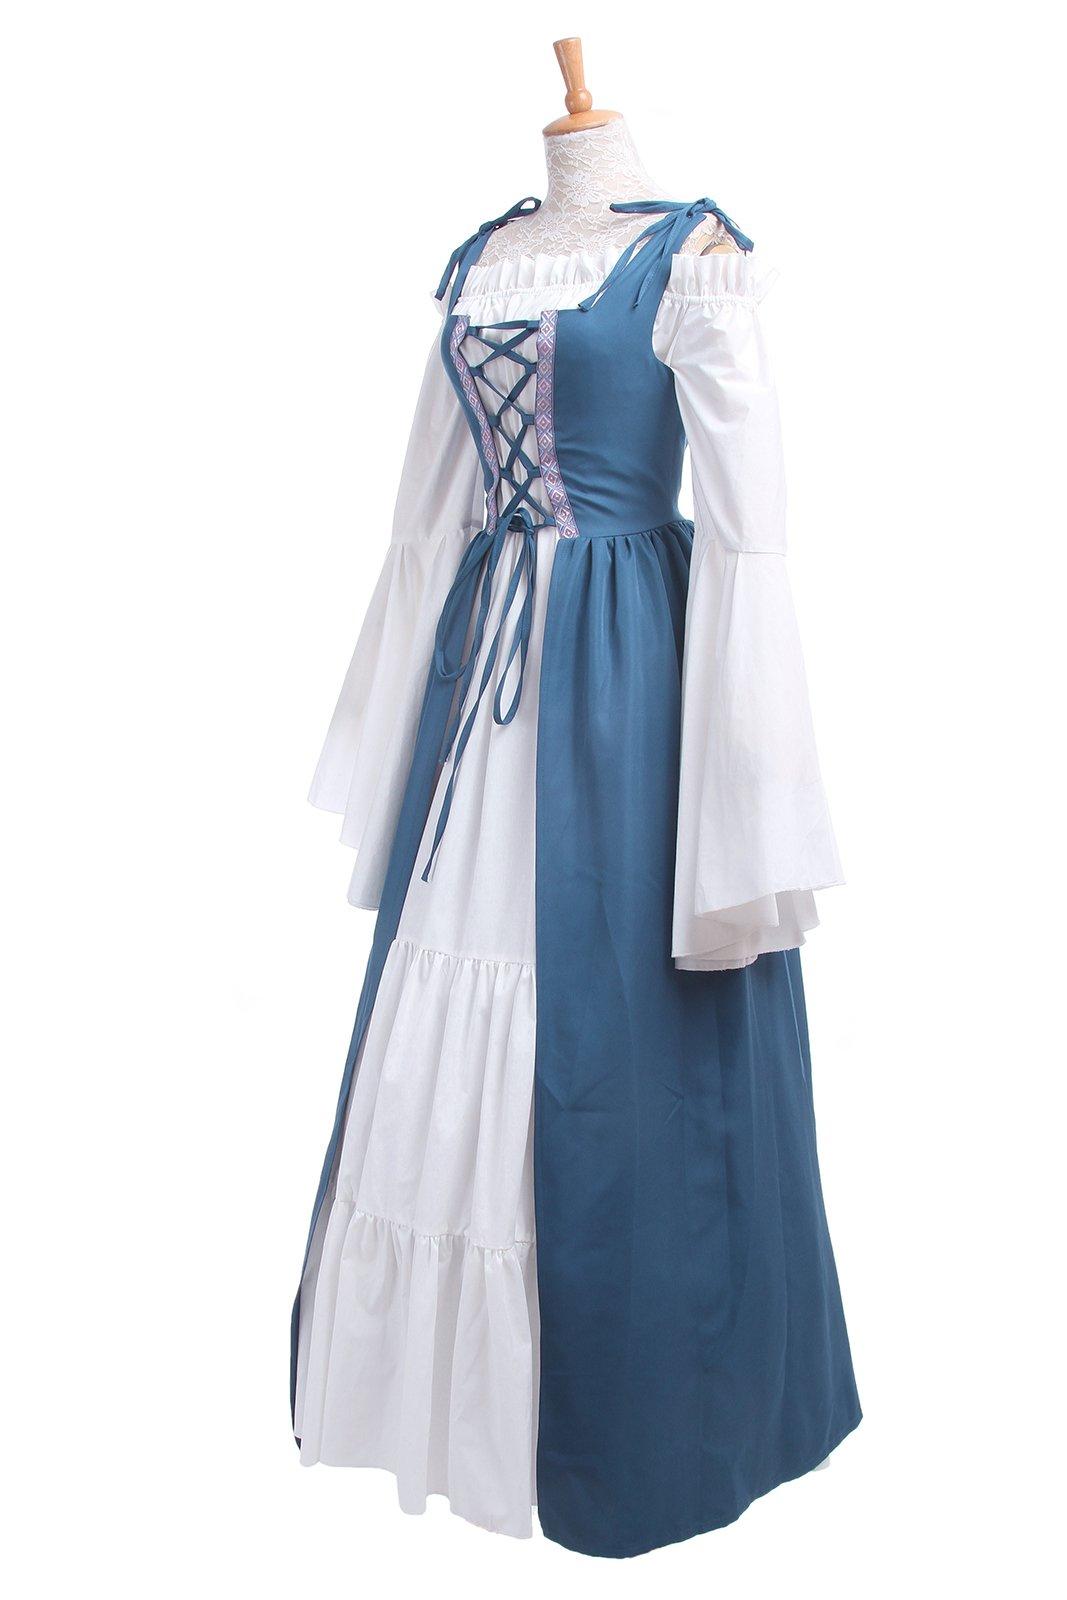 ROLECOS Womens Renaissance Medieval Irish Costume Boho Underdress Overdress Coat Light Blue L by ROLECOS (Image #5)